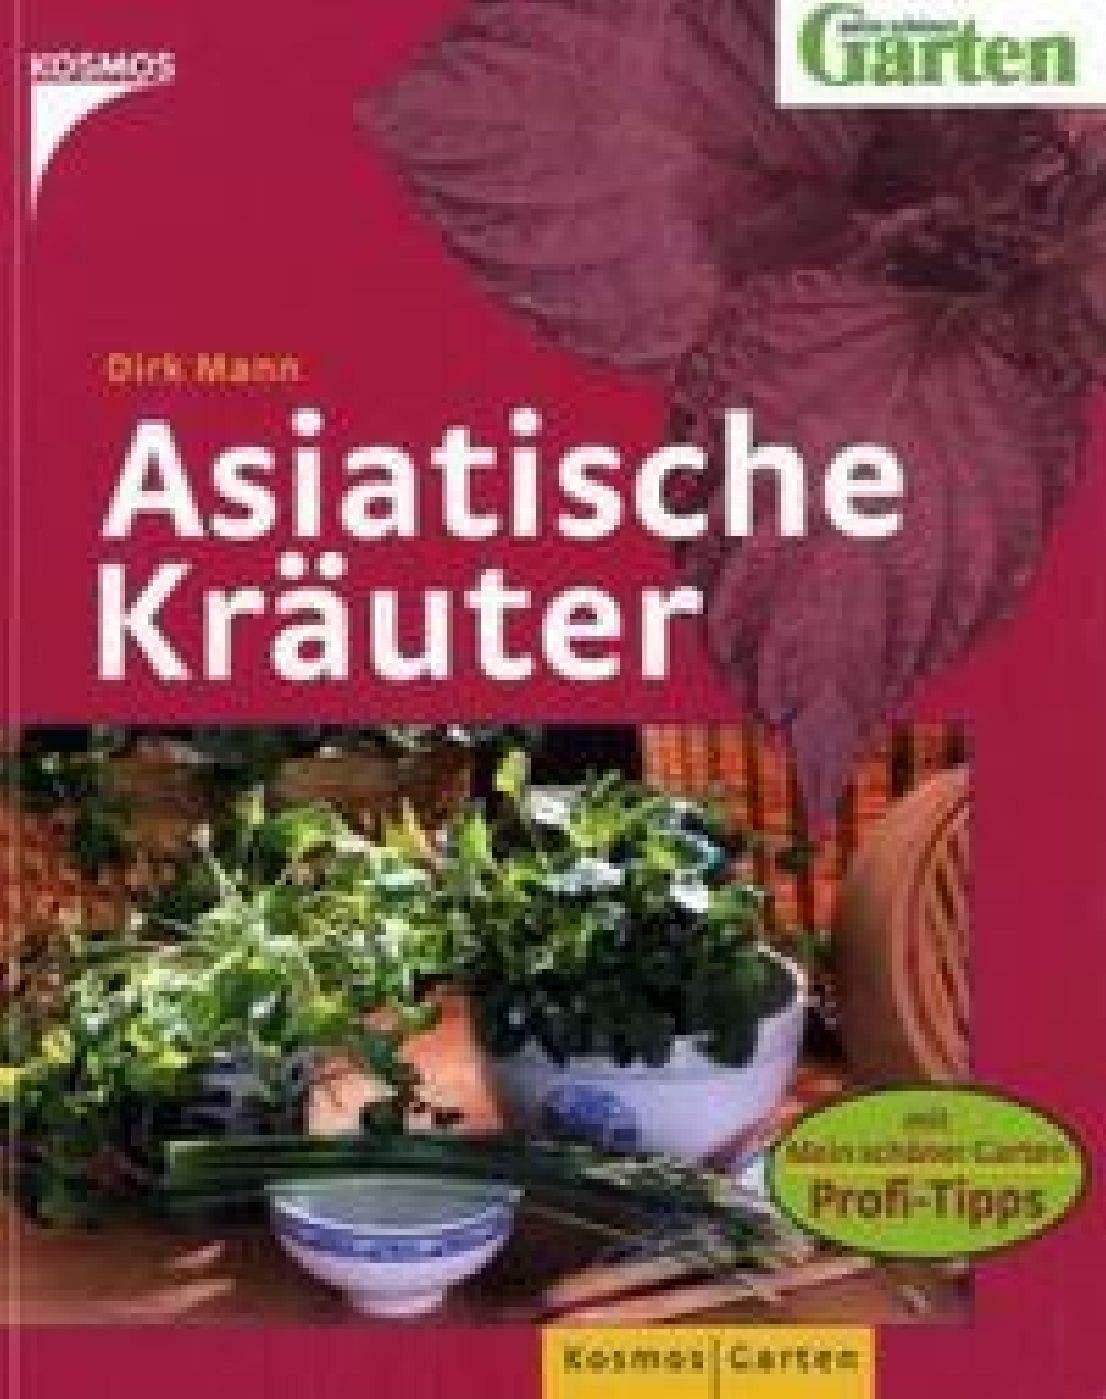 1863 Asiatische Kruter Dirk Mann 15cc5c6d9bbafa 900x900 2x